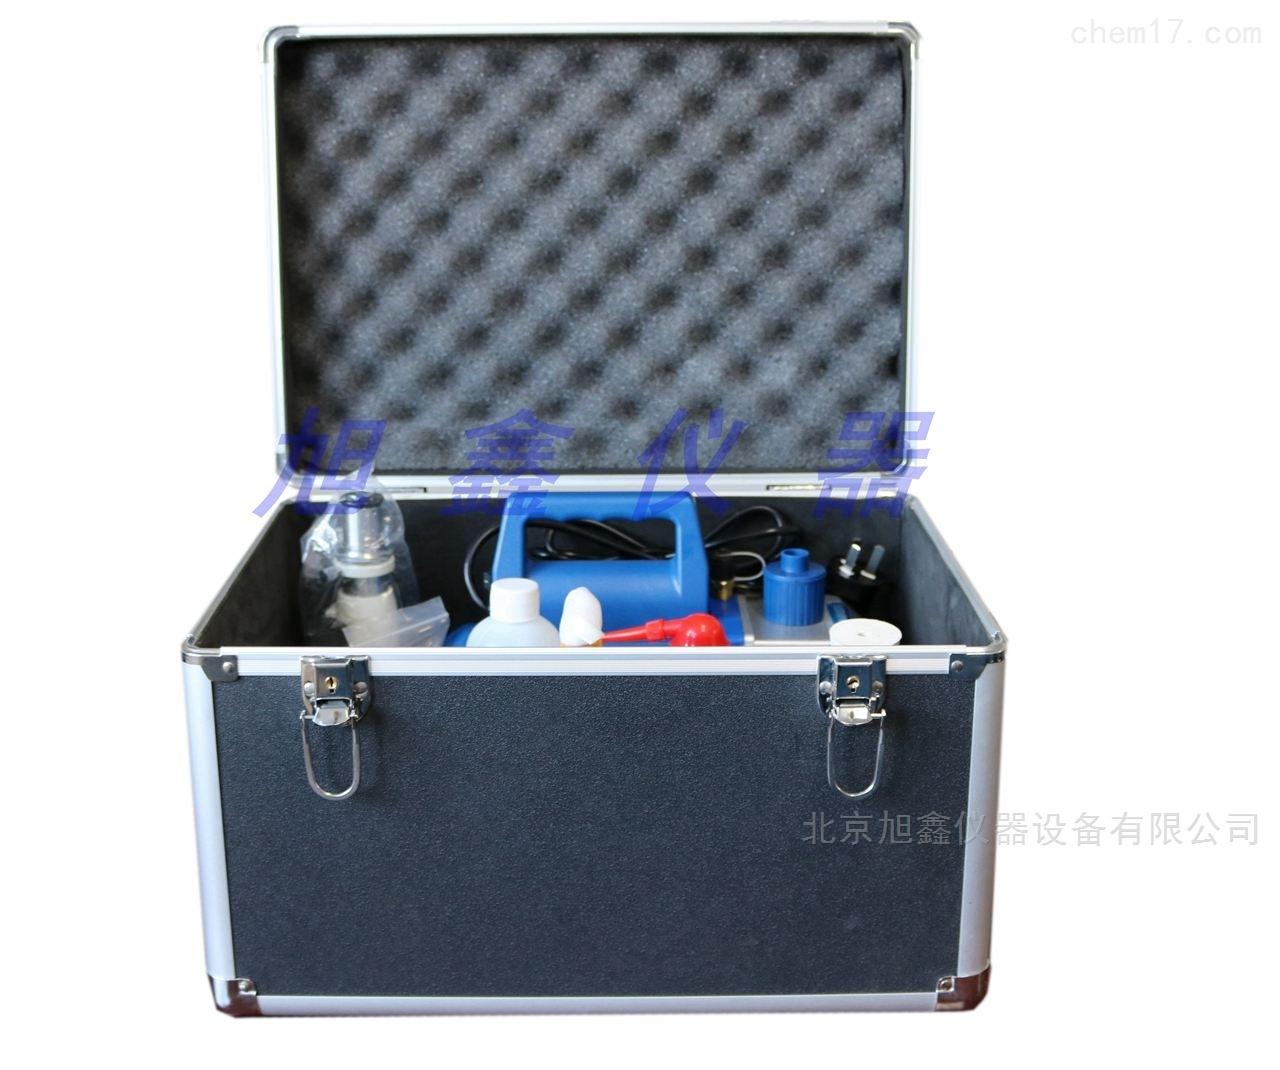 ST-1519便携式油液污染度测定仪